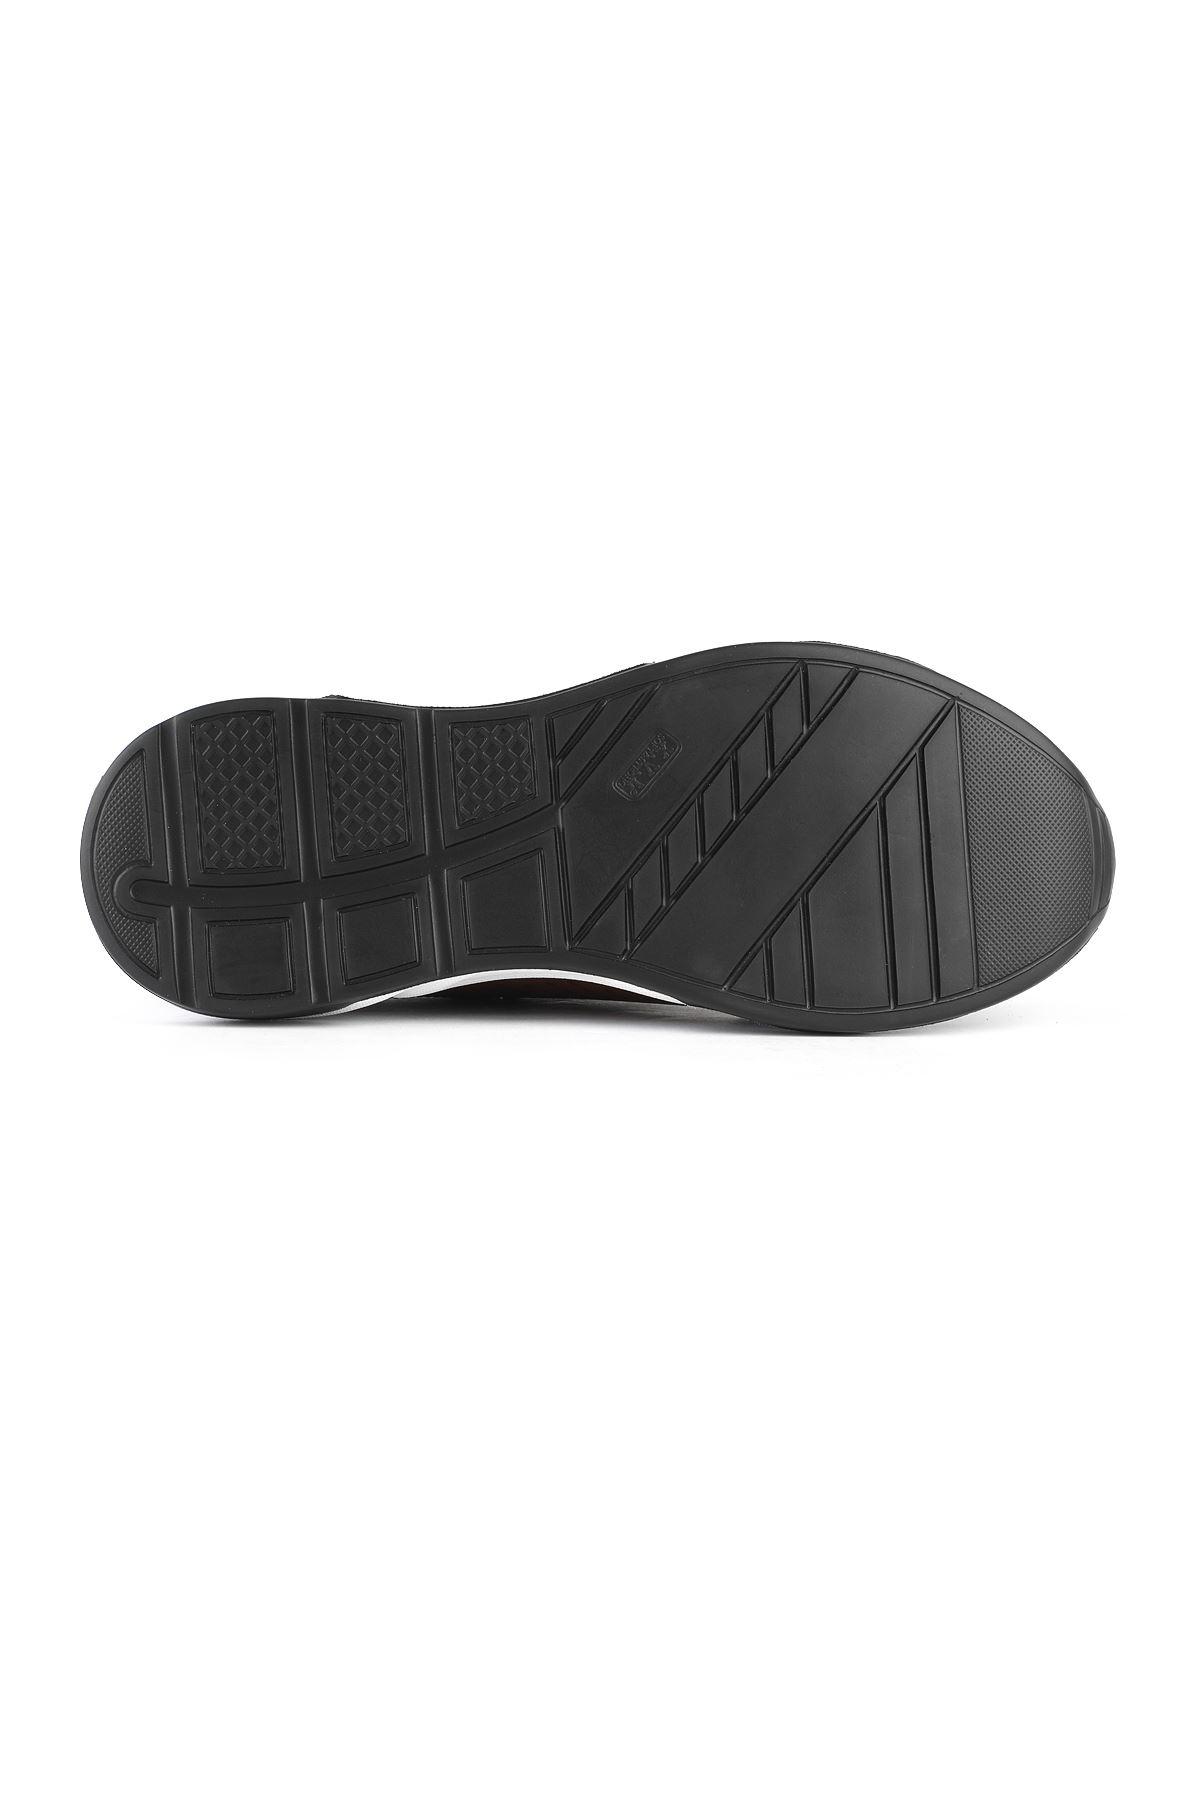 Libero 3313 Brown Sports Shoes